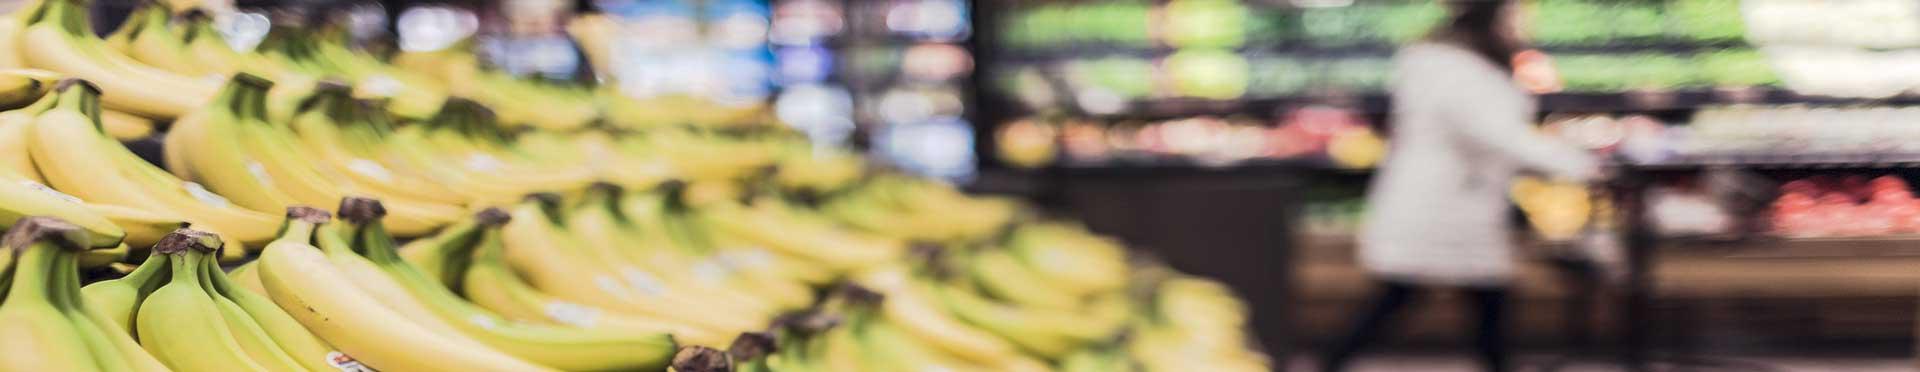 Información nutricional de alimentos de supermercado